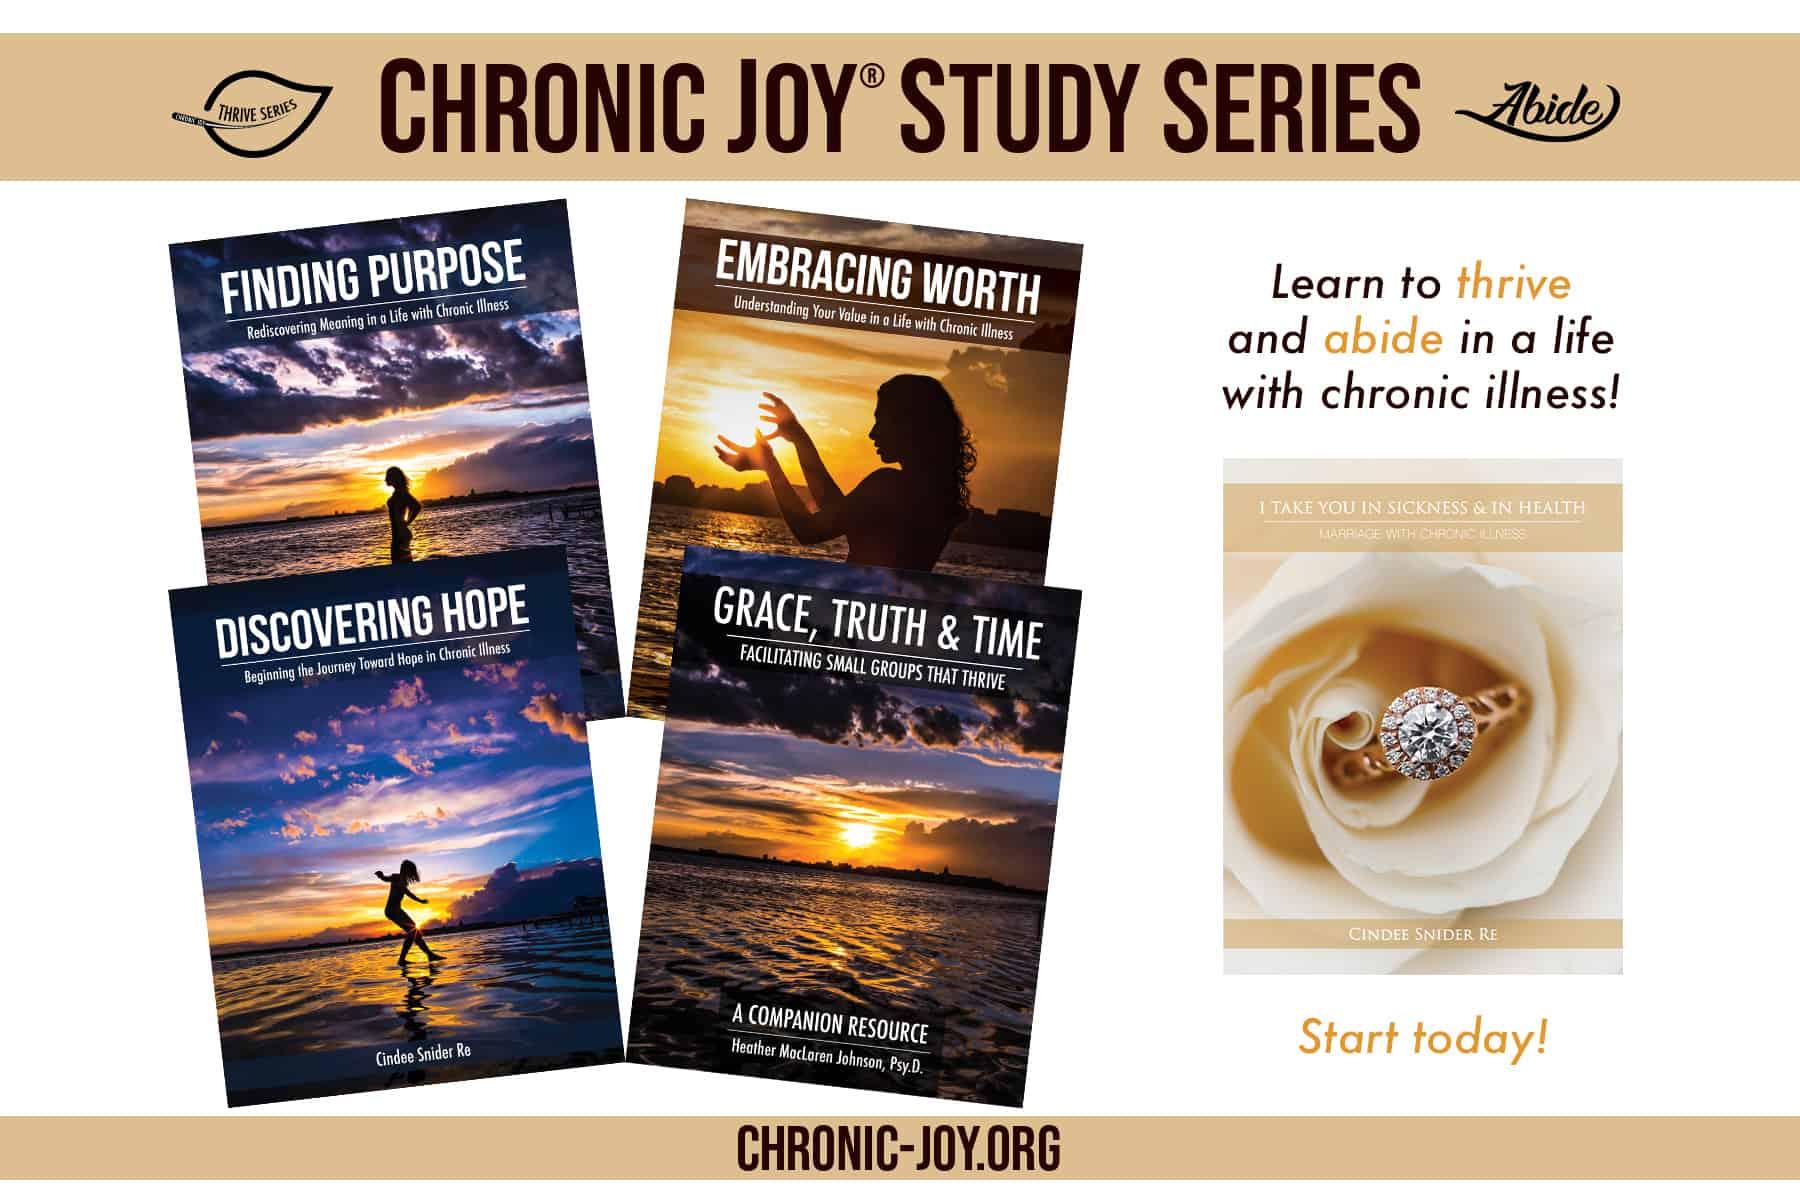 Chronic Joy® Study Series